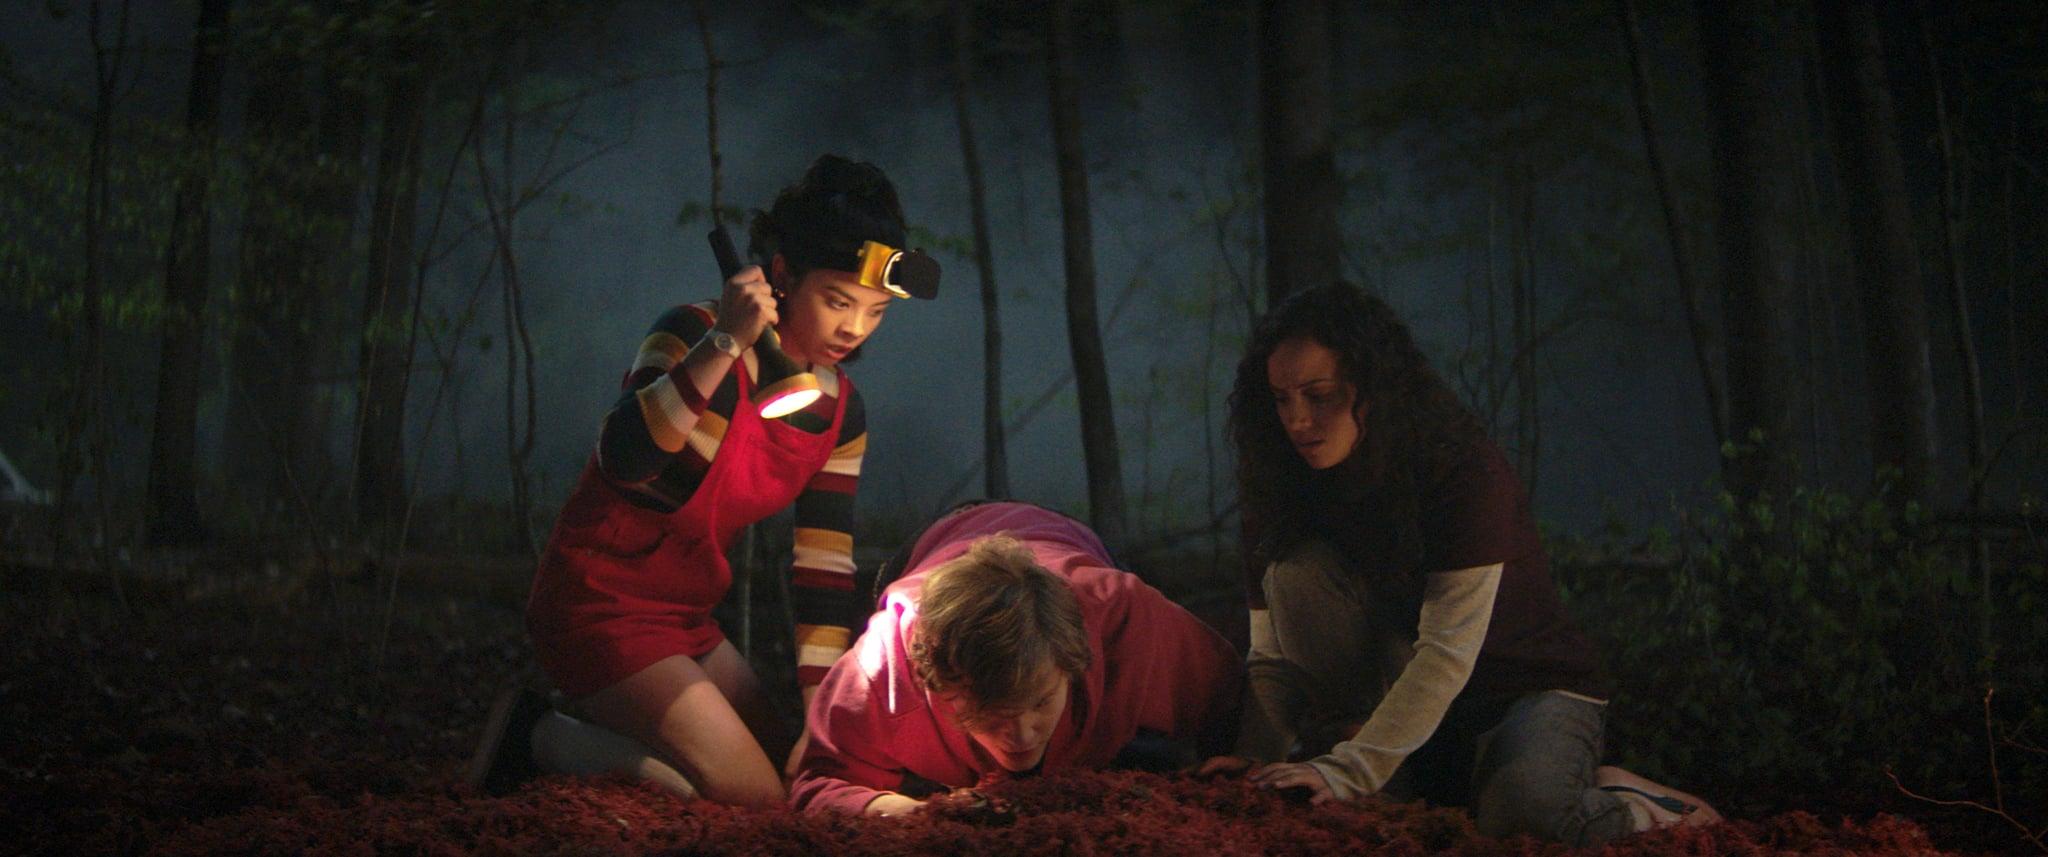 FEAR STREET PART 1: 1994 - (L-R) JULIA REHWALD as KATE, FRED HECHINGER as SIMON and KIANA MADEIRA as DEENA . Cr: Netflix © 2021